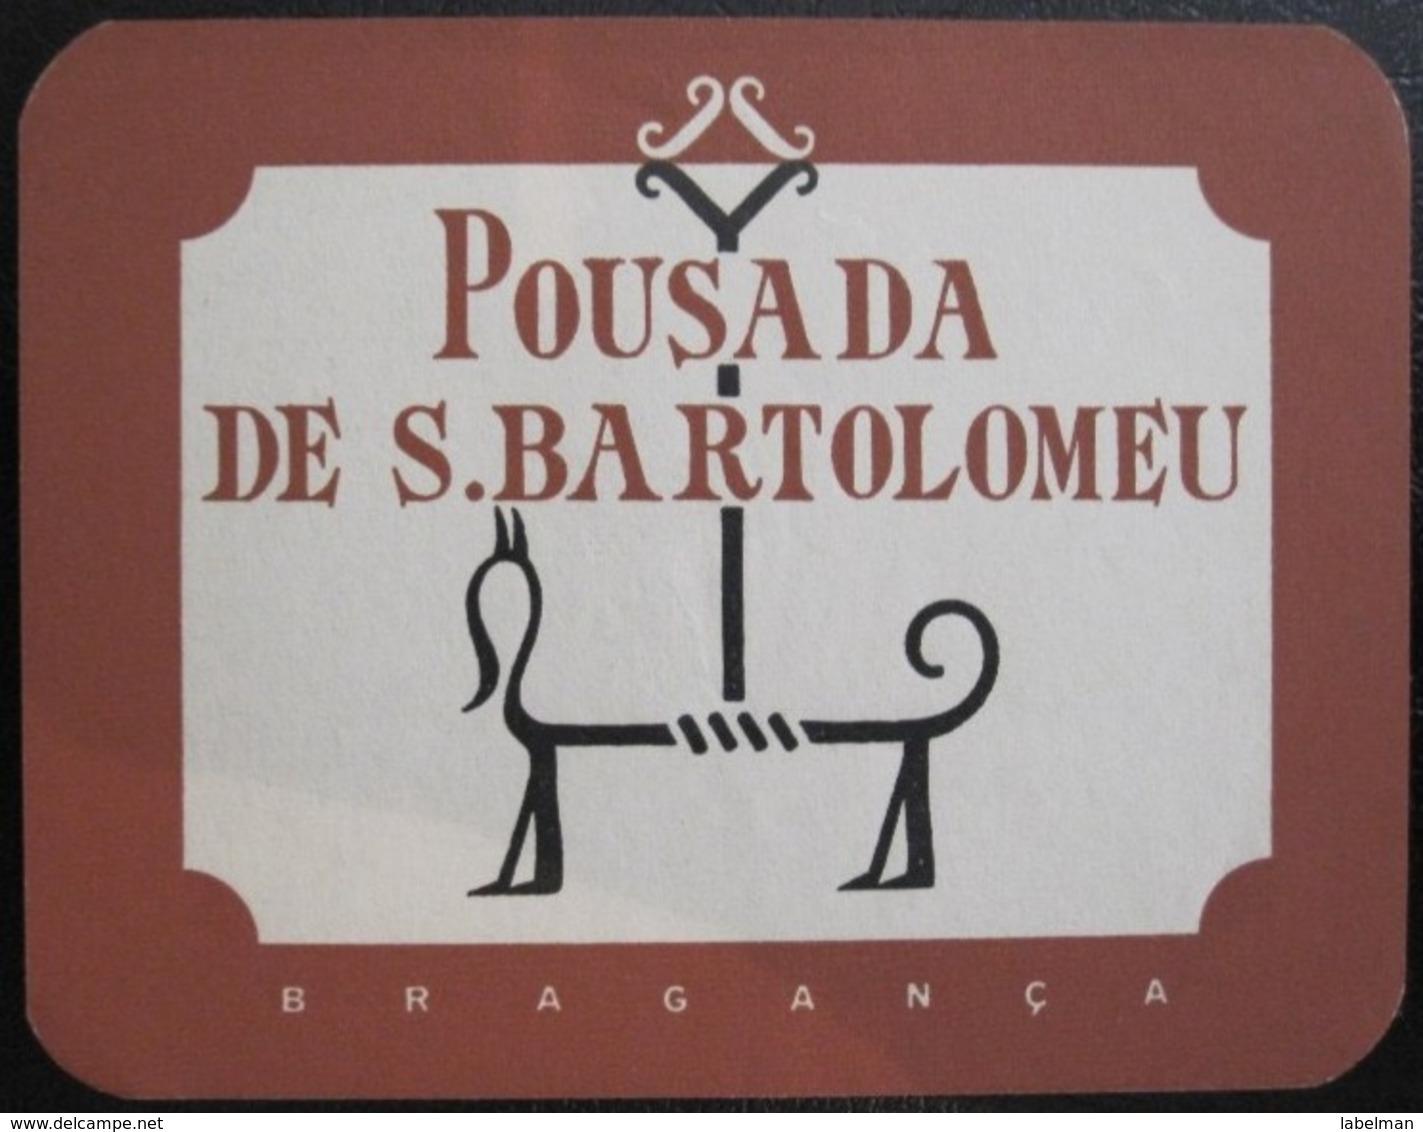 HOTEL PENSAO RESIDENCIAL PENSION BARTOLOMEU BRAGANCA TAG DECAL STICKER LUGGAGE LABEL ETIQUETTE AUFKLEBER PORTUGAL - Hotel Labels